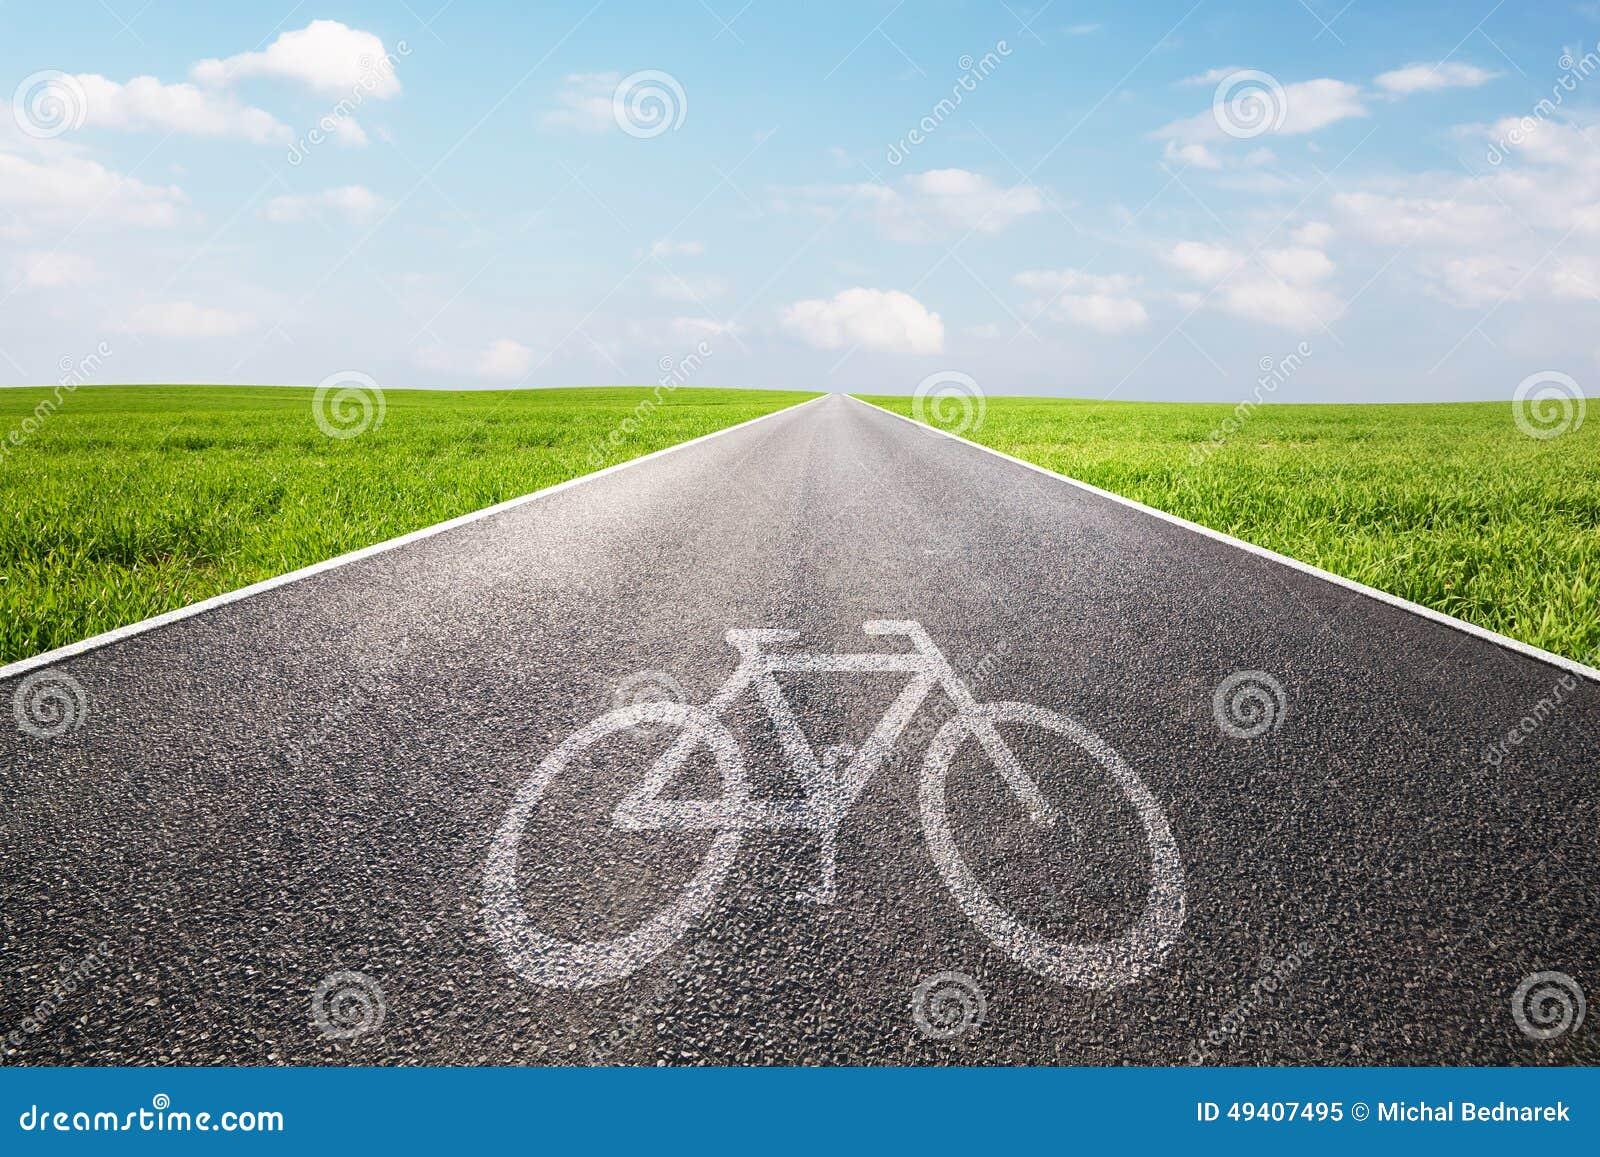 Bike symbol on long straight asphalt road, way